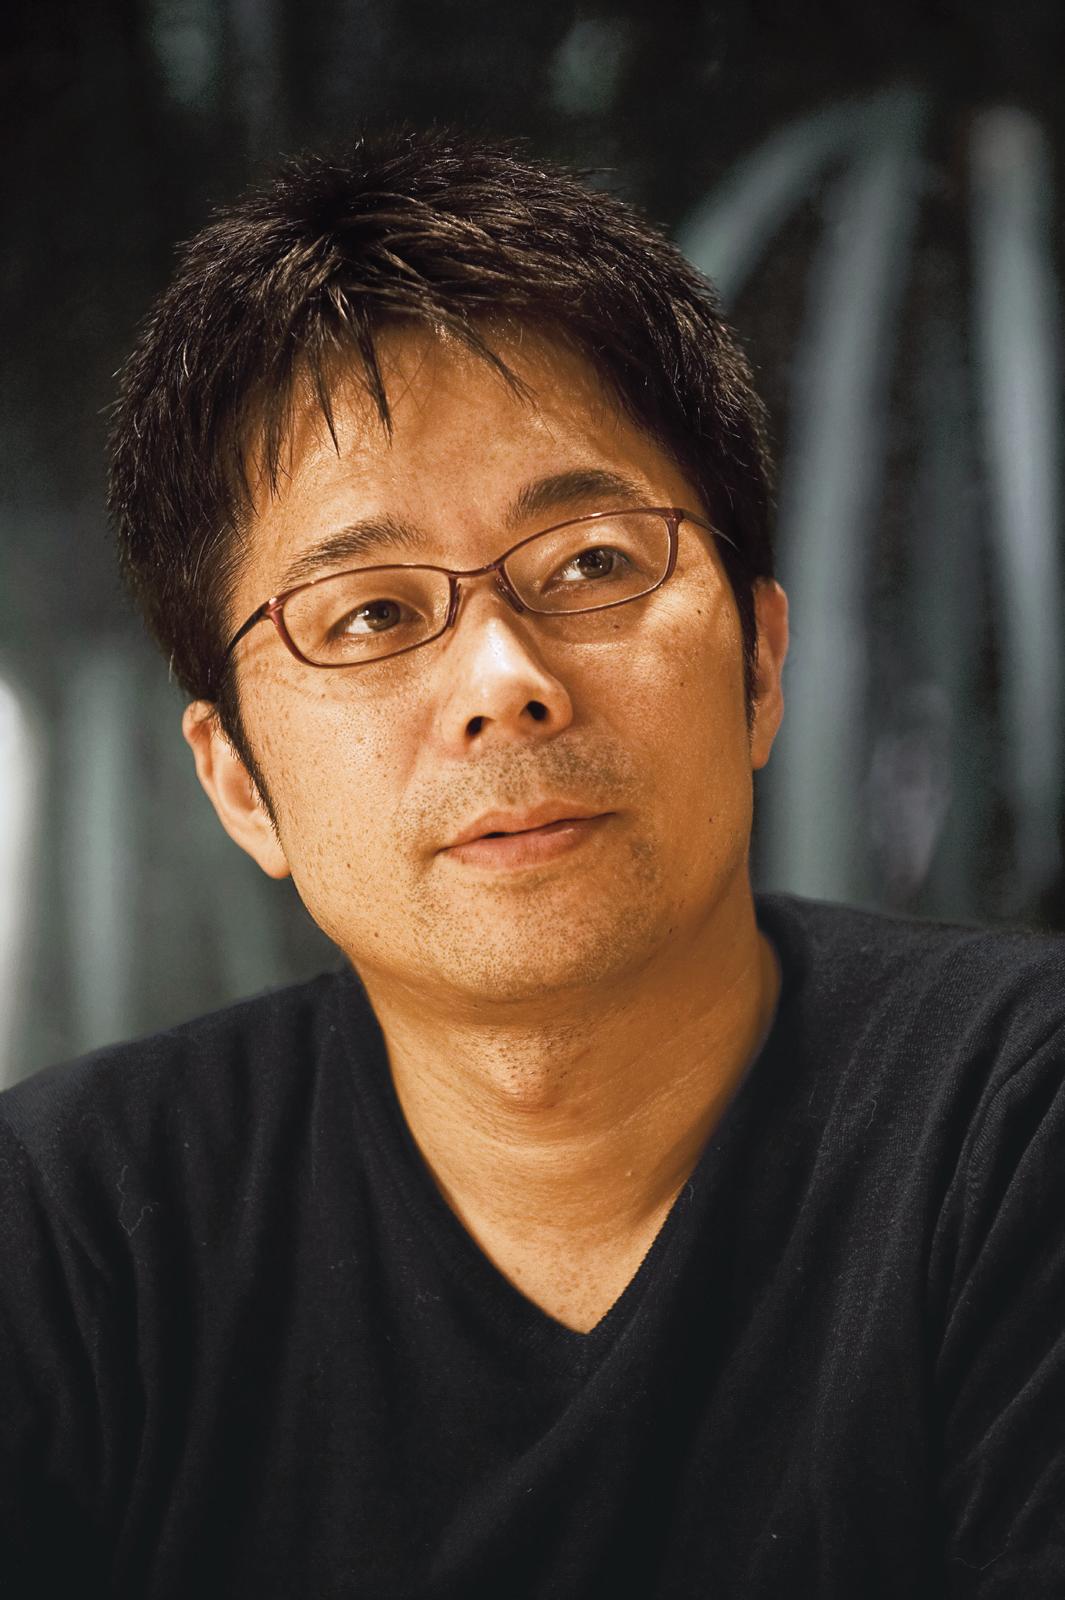 Tokujin Yoshioka portrait by Masahiro Okamura